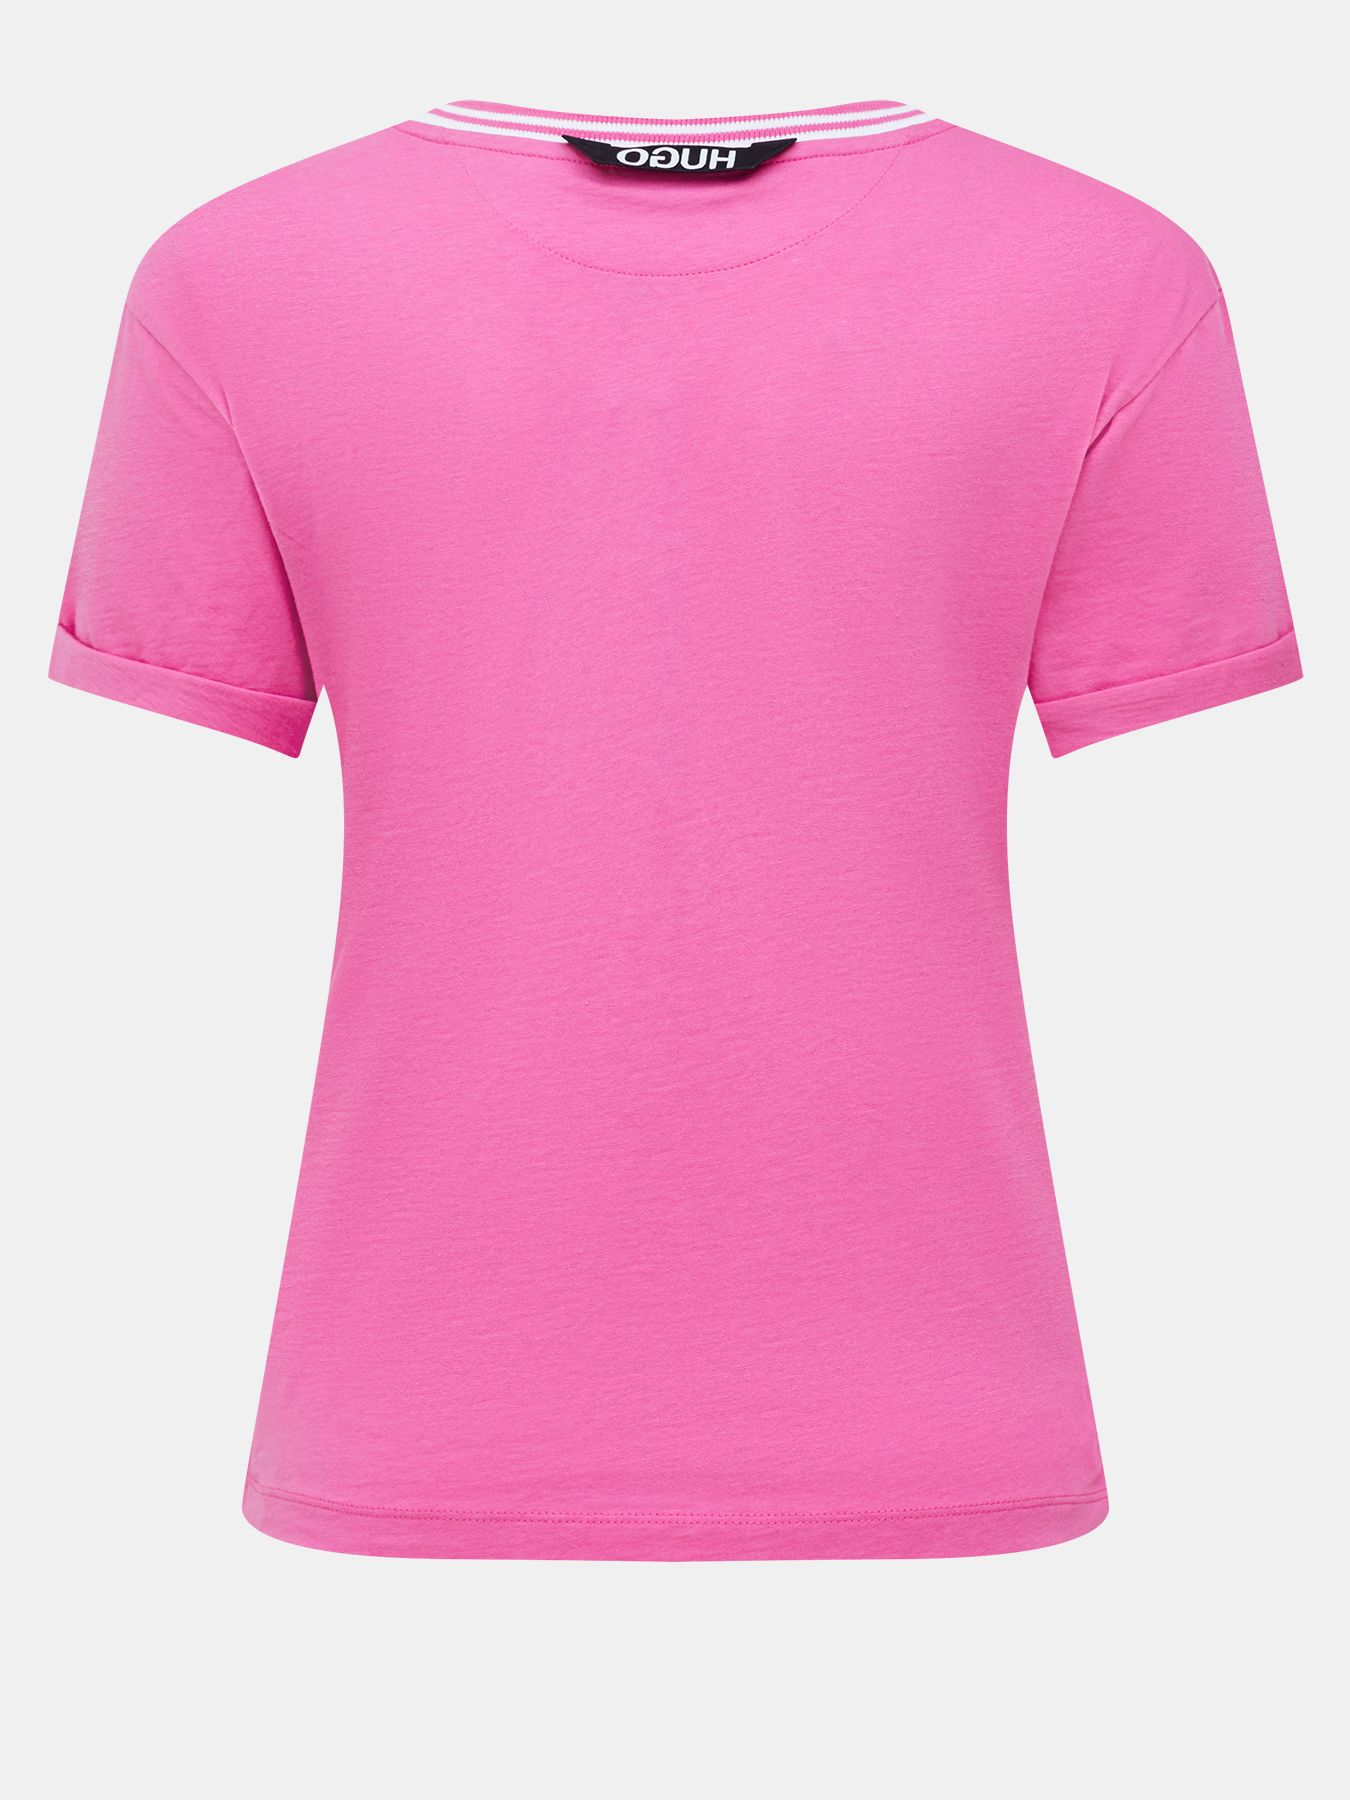 Фуфайка (футболка) HUGO Футболка Datina фуфайка футболка hugo футболка drosal